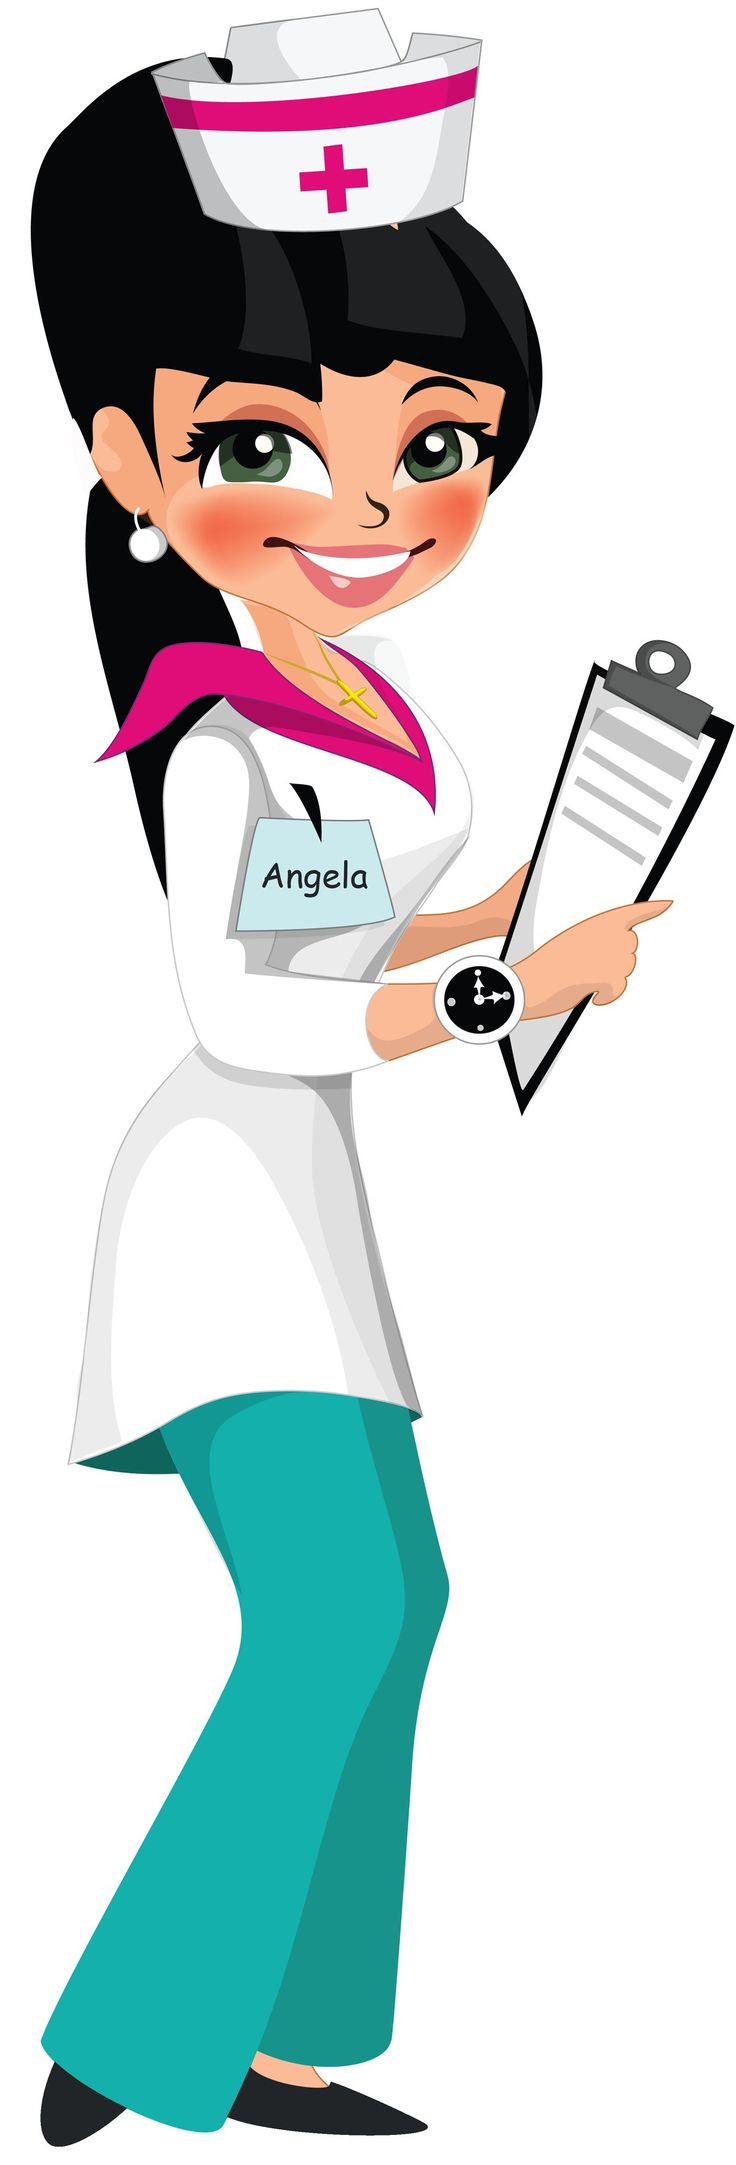 736x2165 15 Best Medical Images Clip Art Images On Hospitals